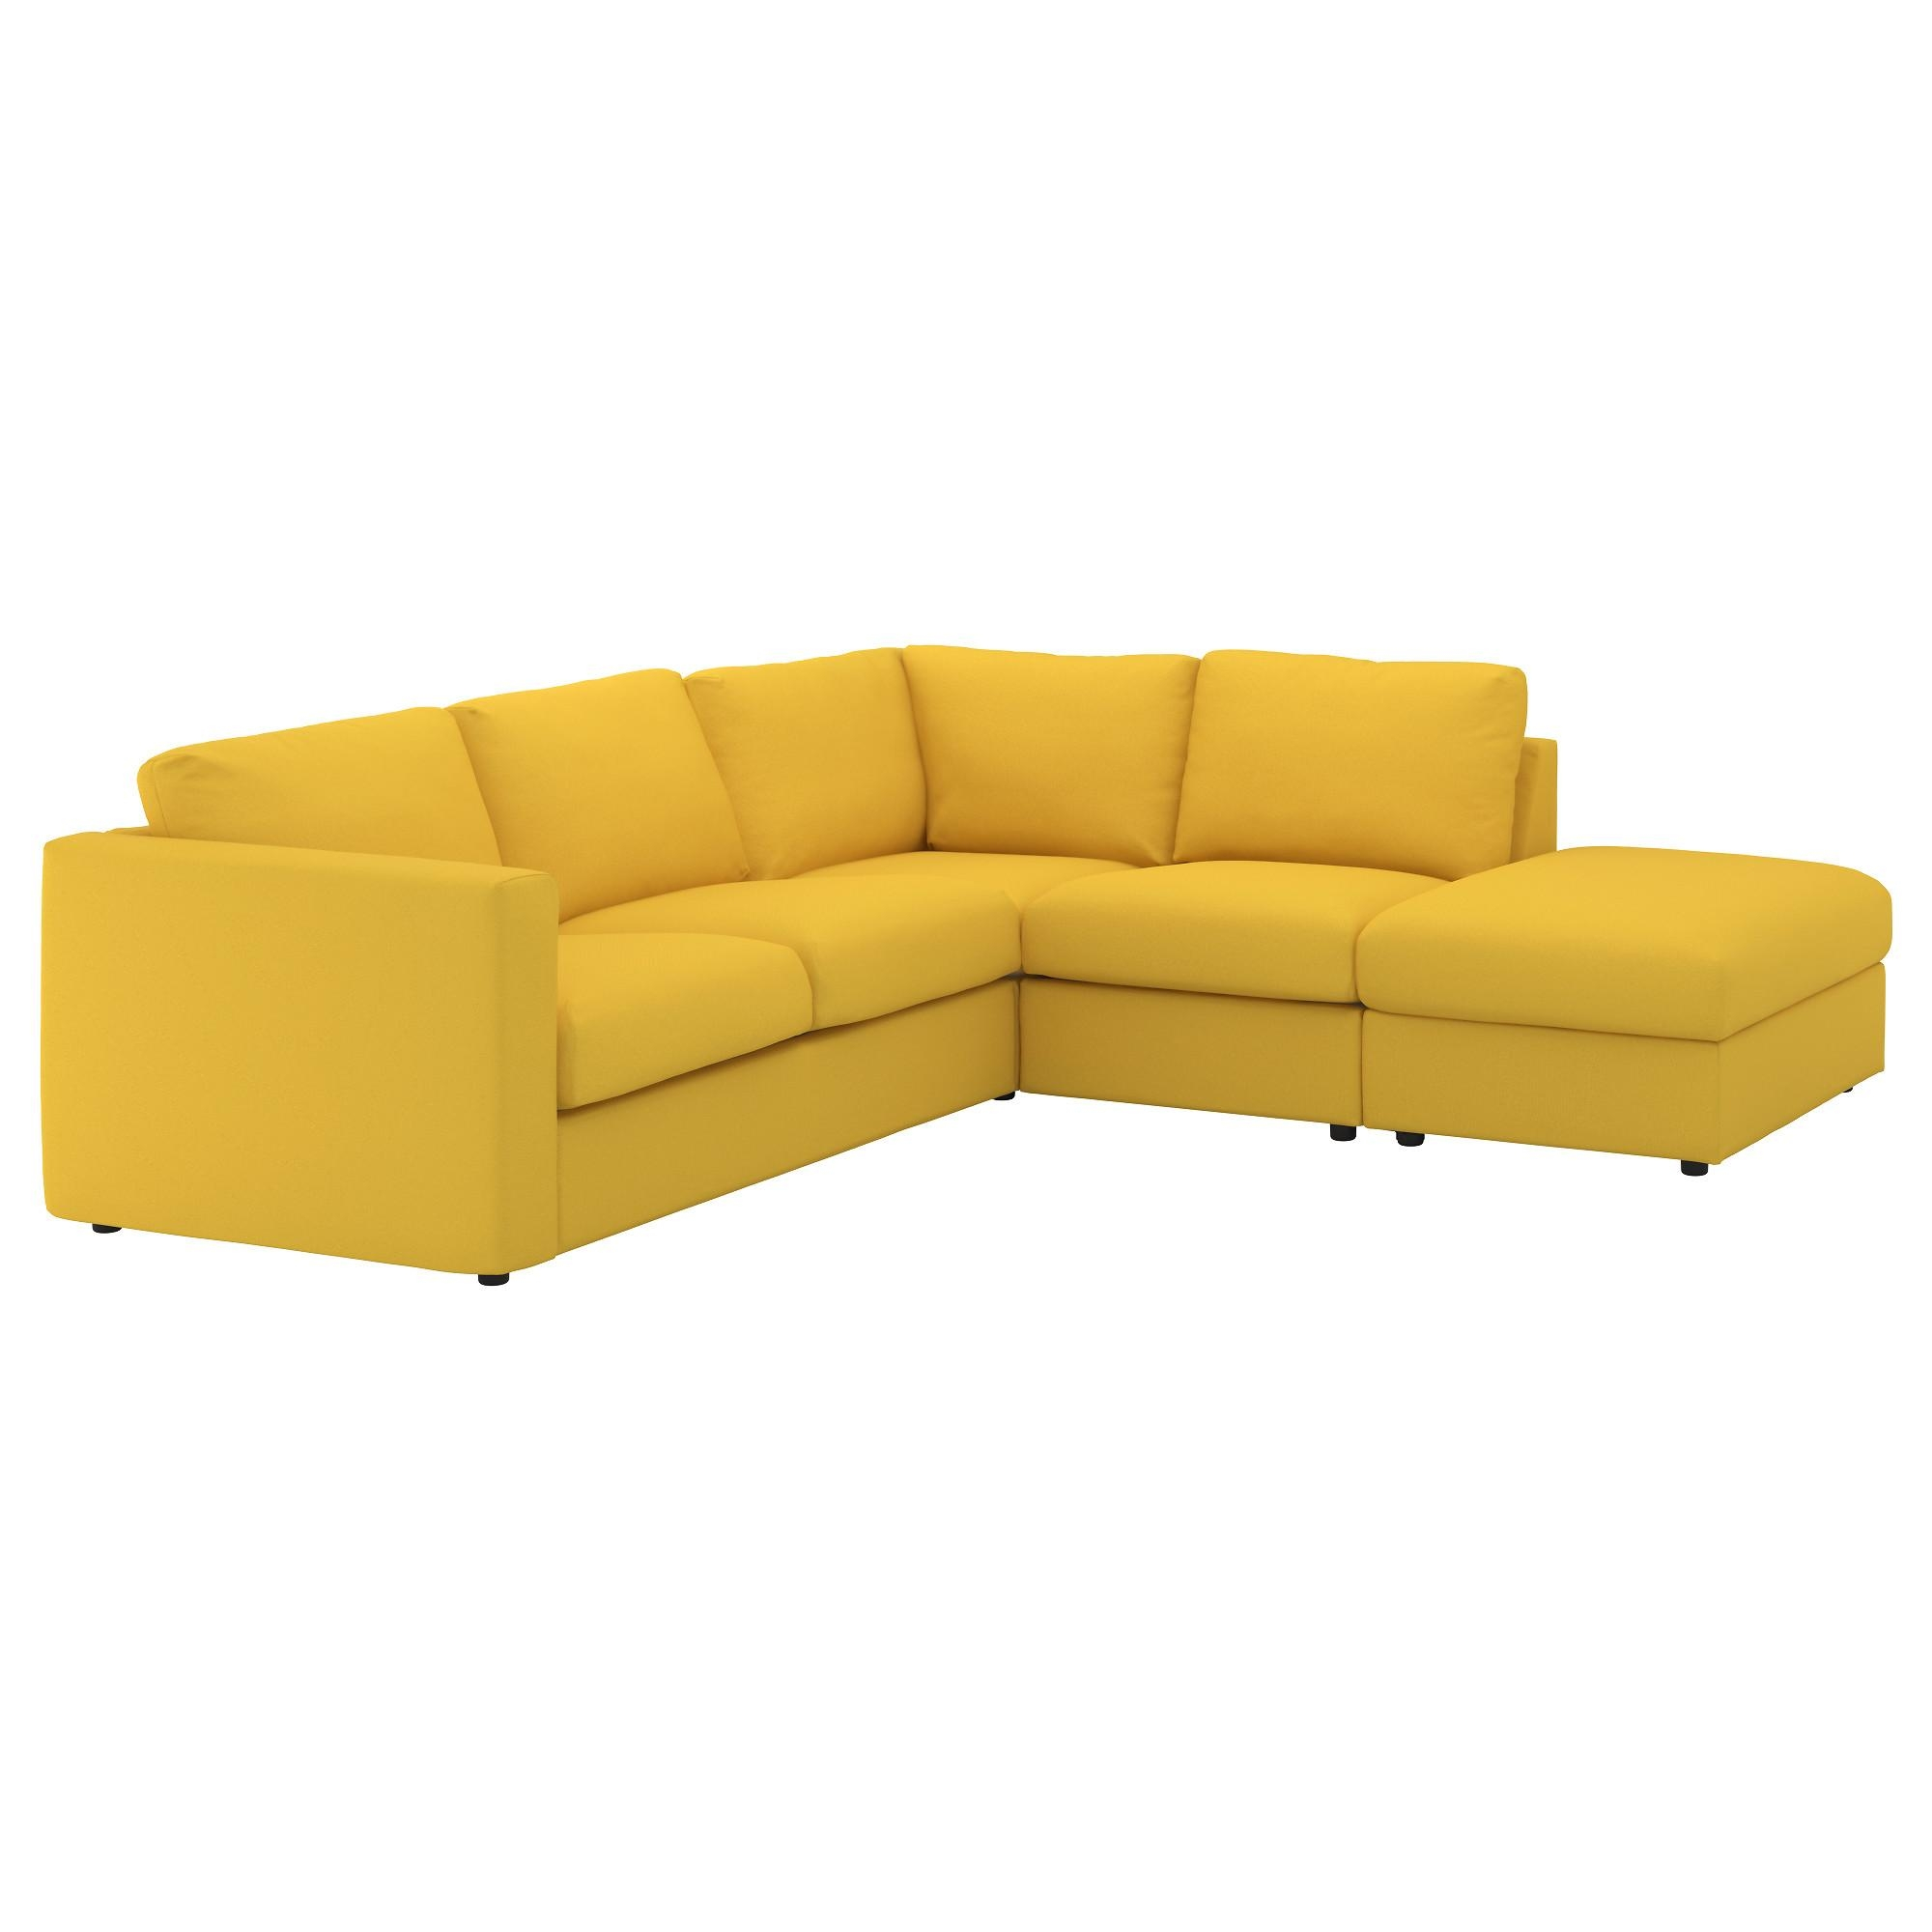 cheap corner sofa beds dublin futon bed canberra 20 43 choices of sofas ideas